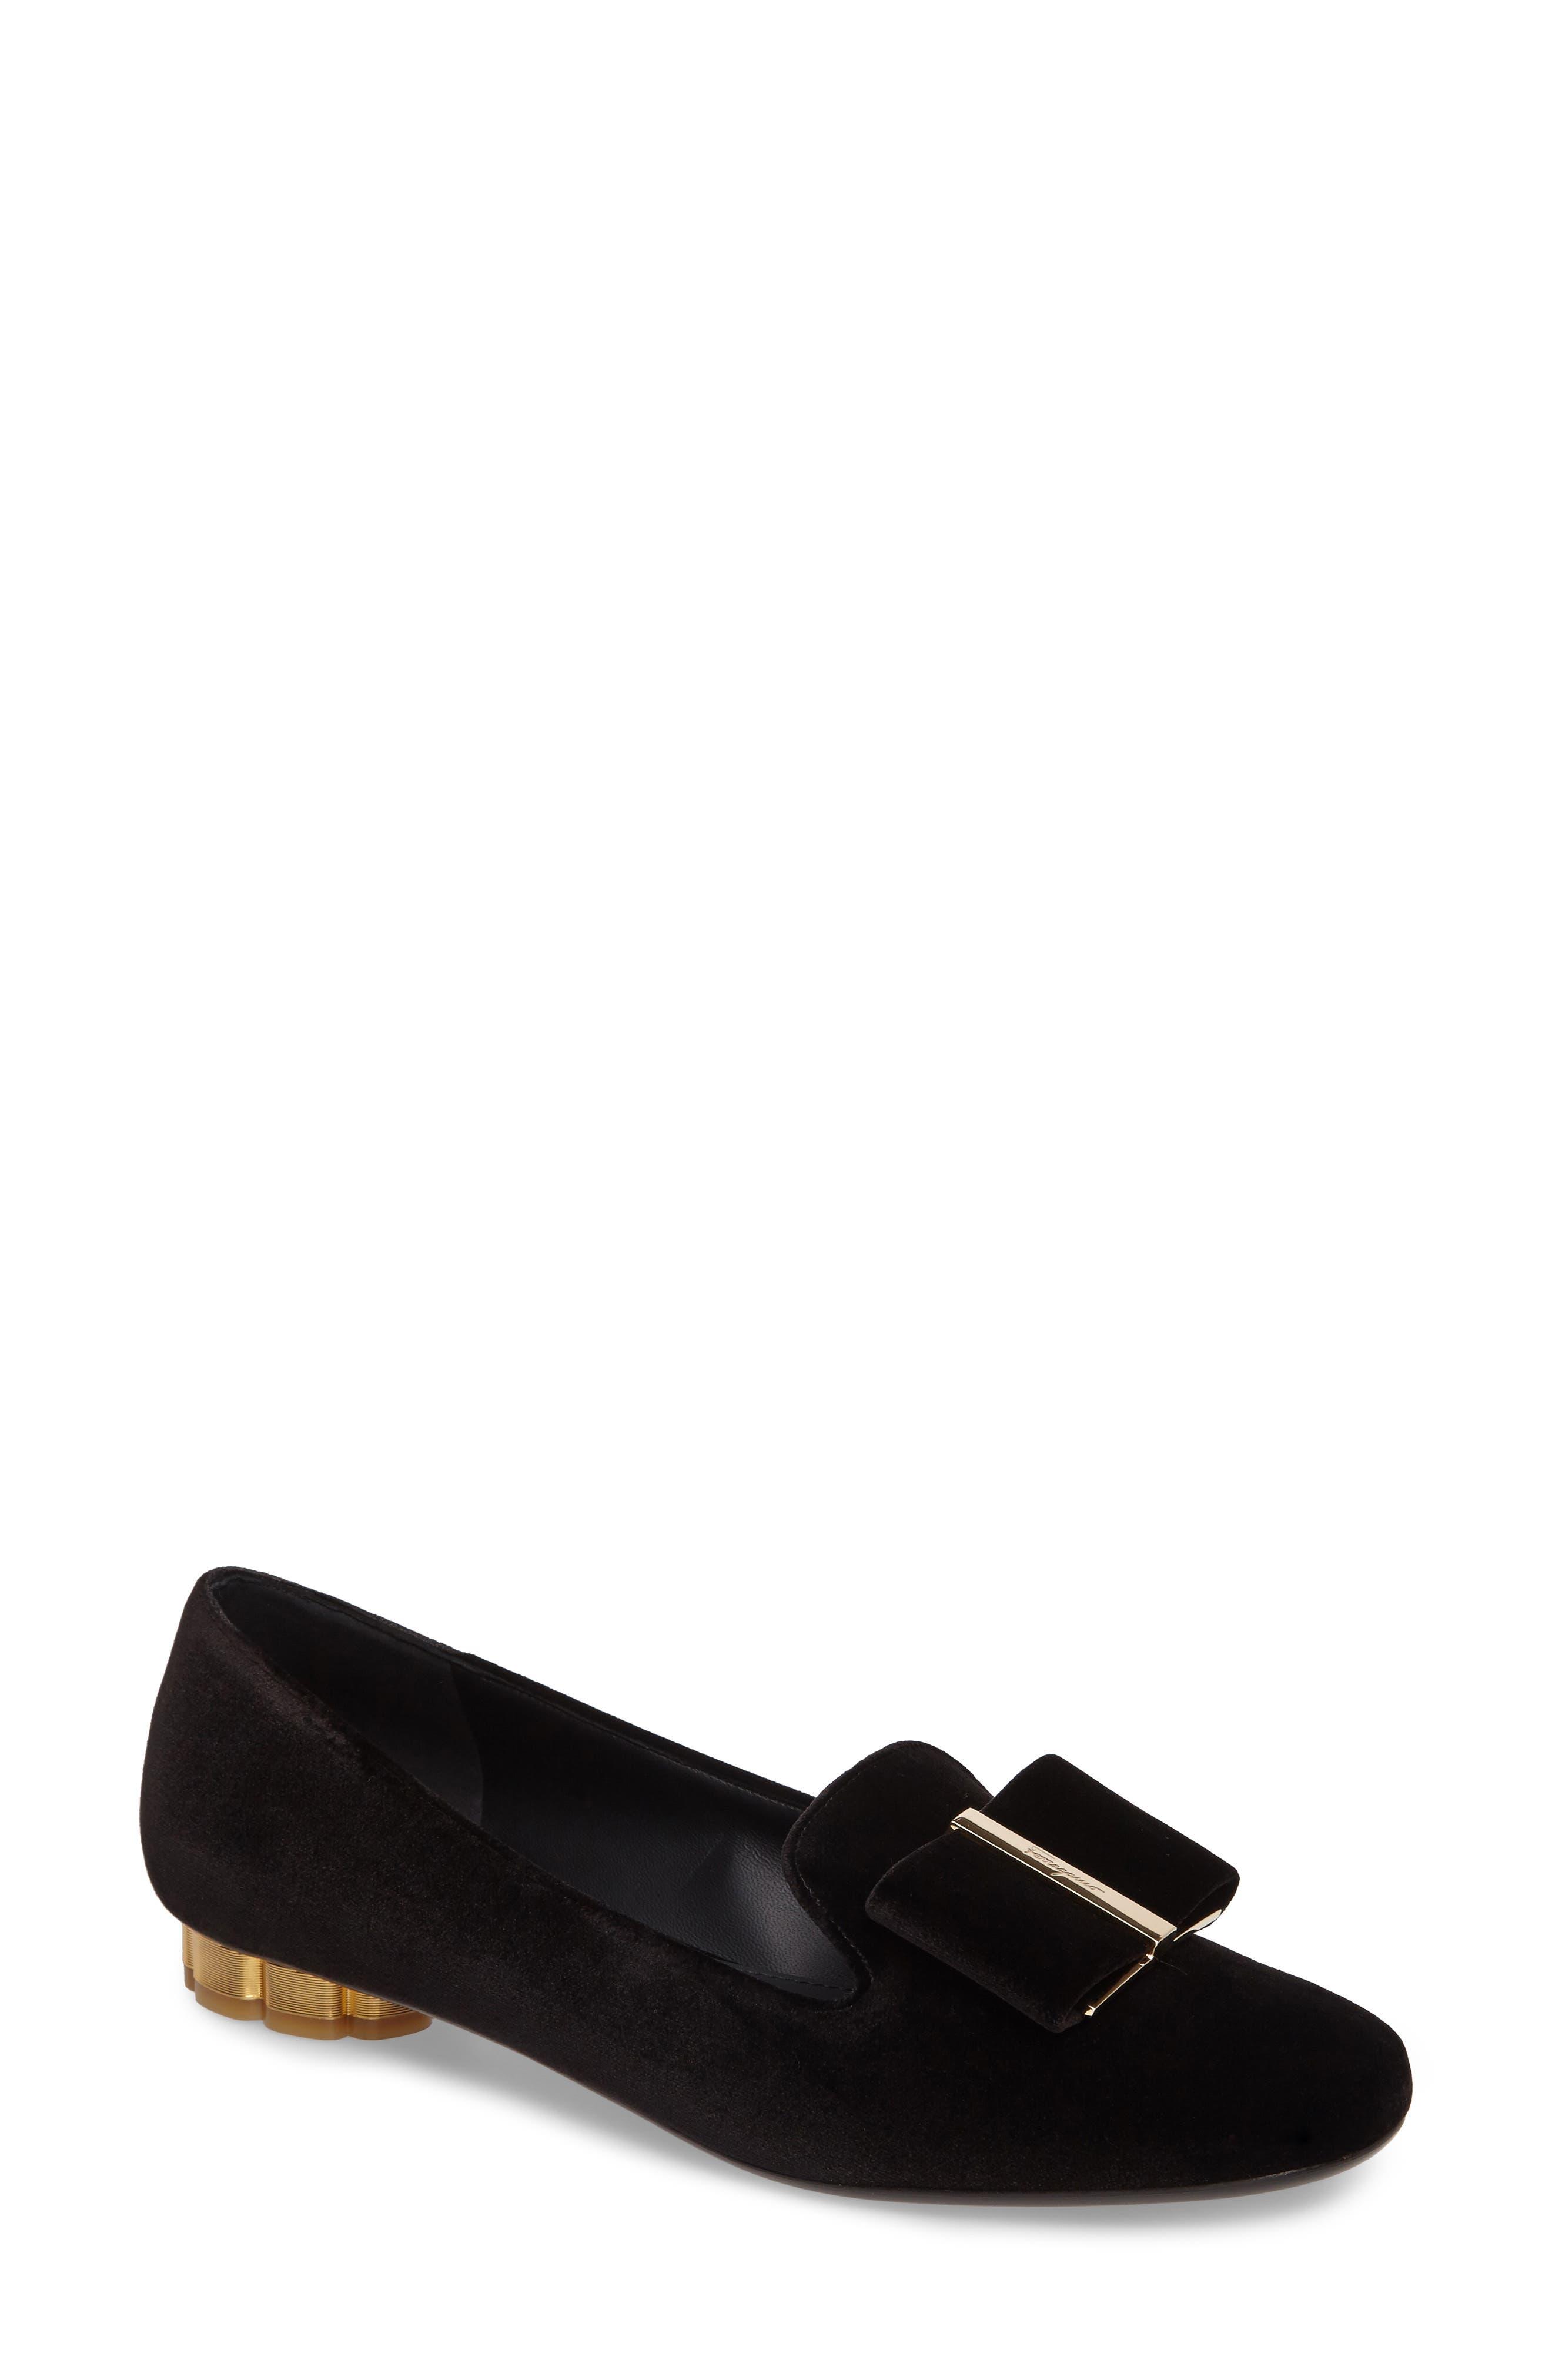 Alternate Image 1 Selected - Salvatore Ferragamo Sarno Flower Heel Smoking Loafer (Women)